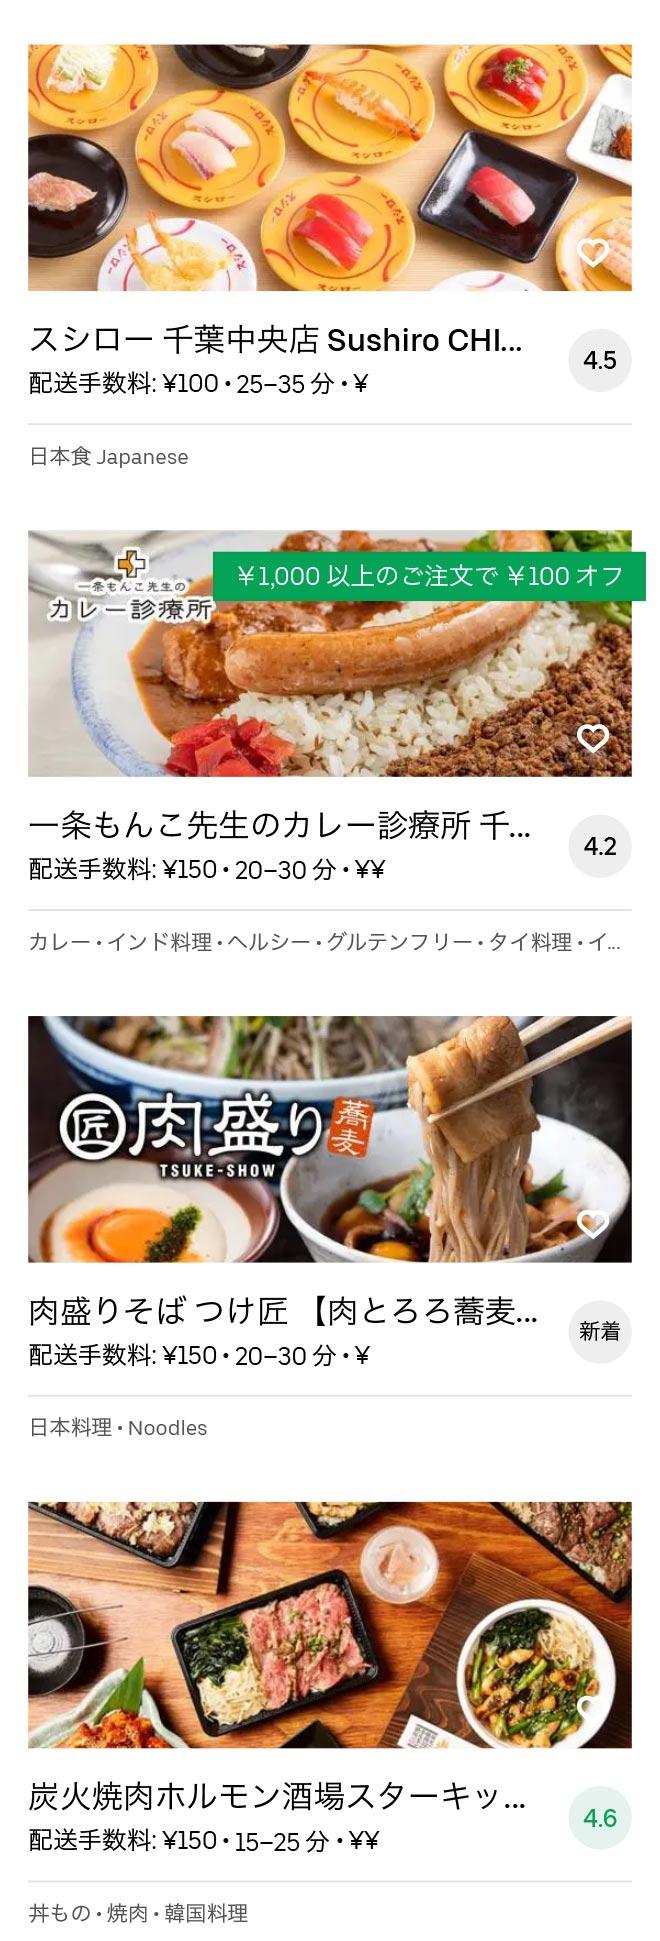 Chiba menu 2010 04